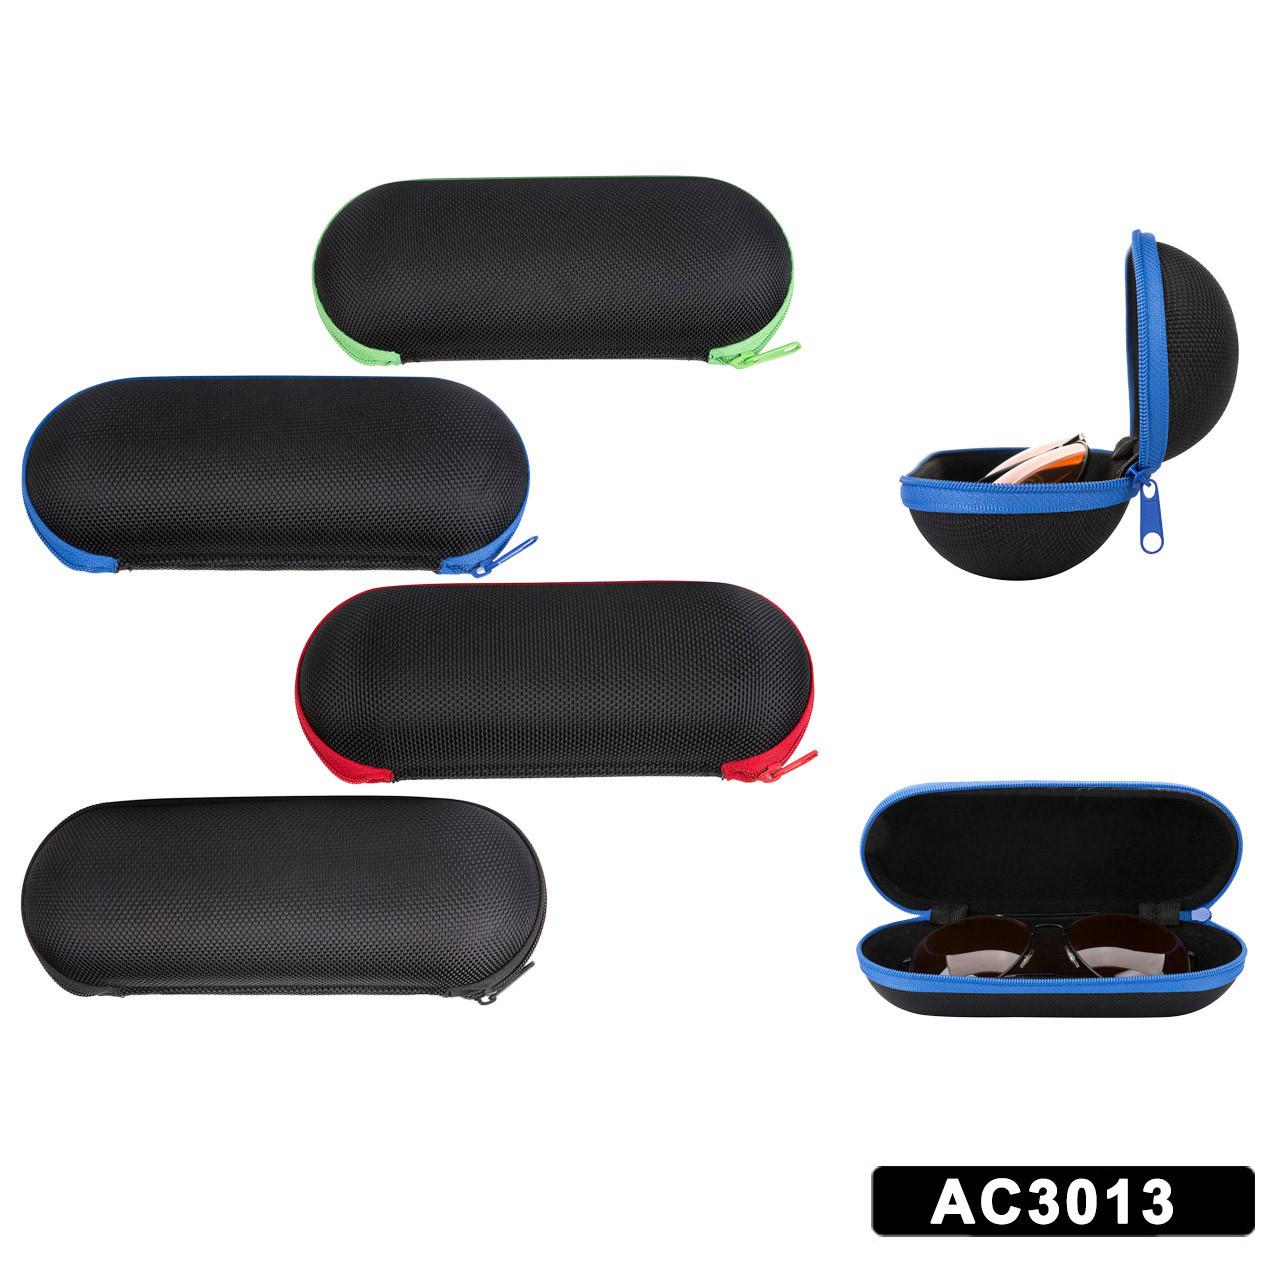 Soft Cases AC3013